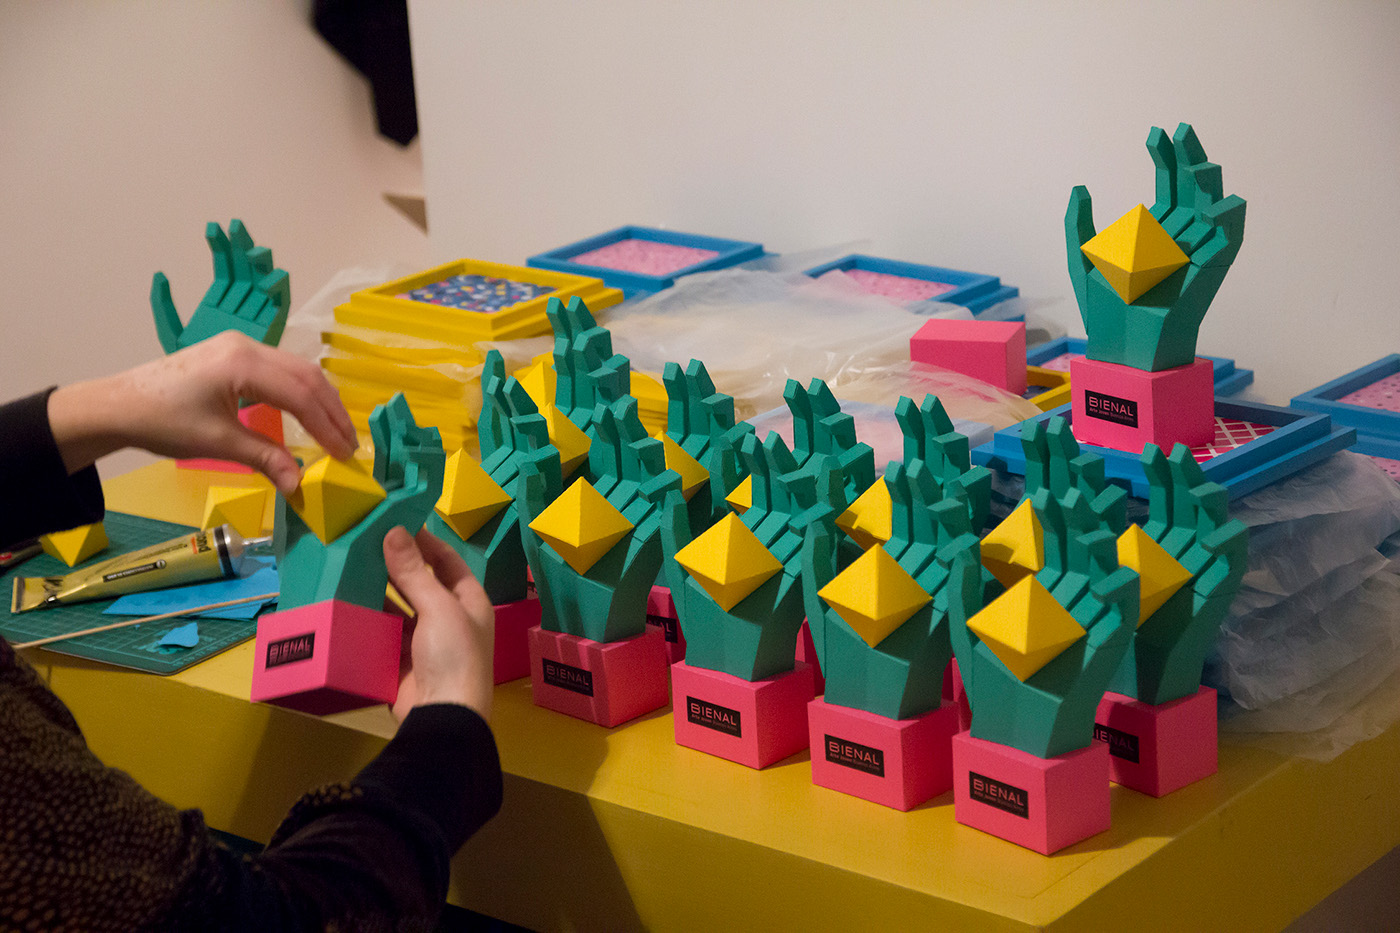 bienal bienal de arte Awards premios papercraft lowpoly hands platonic